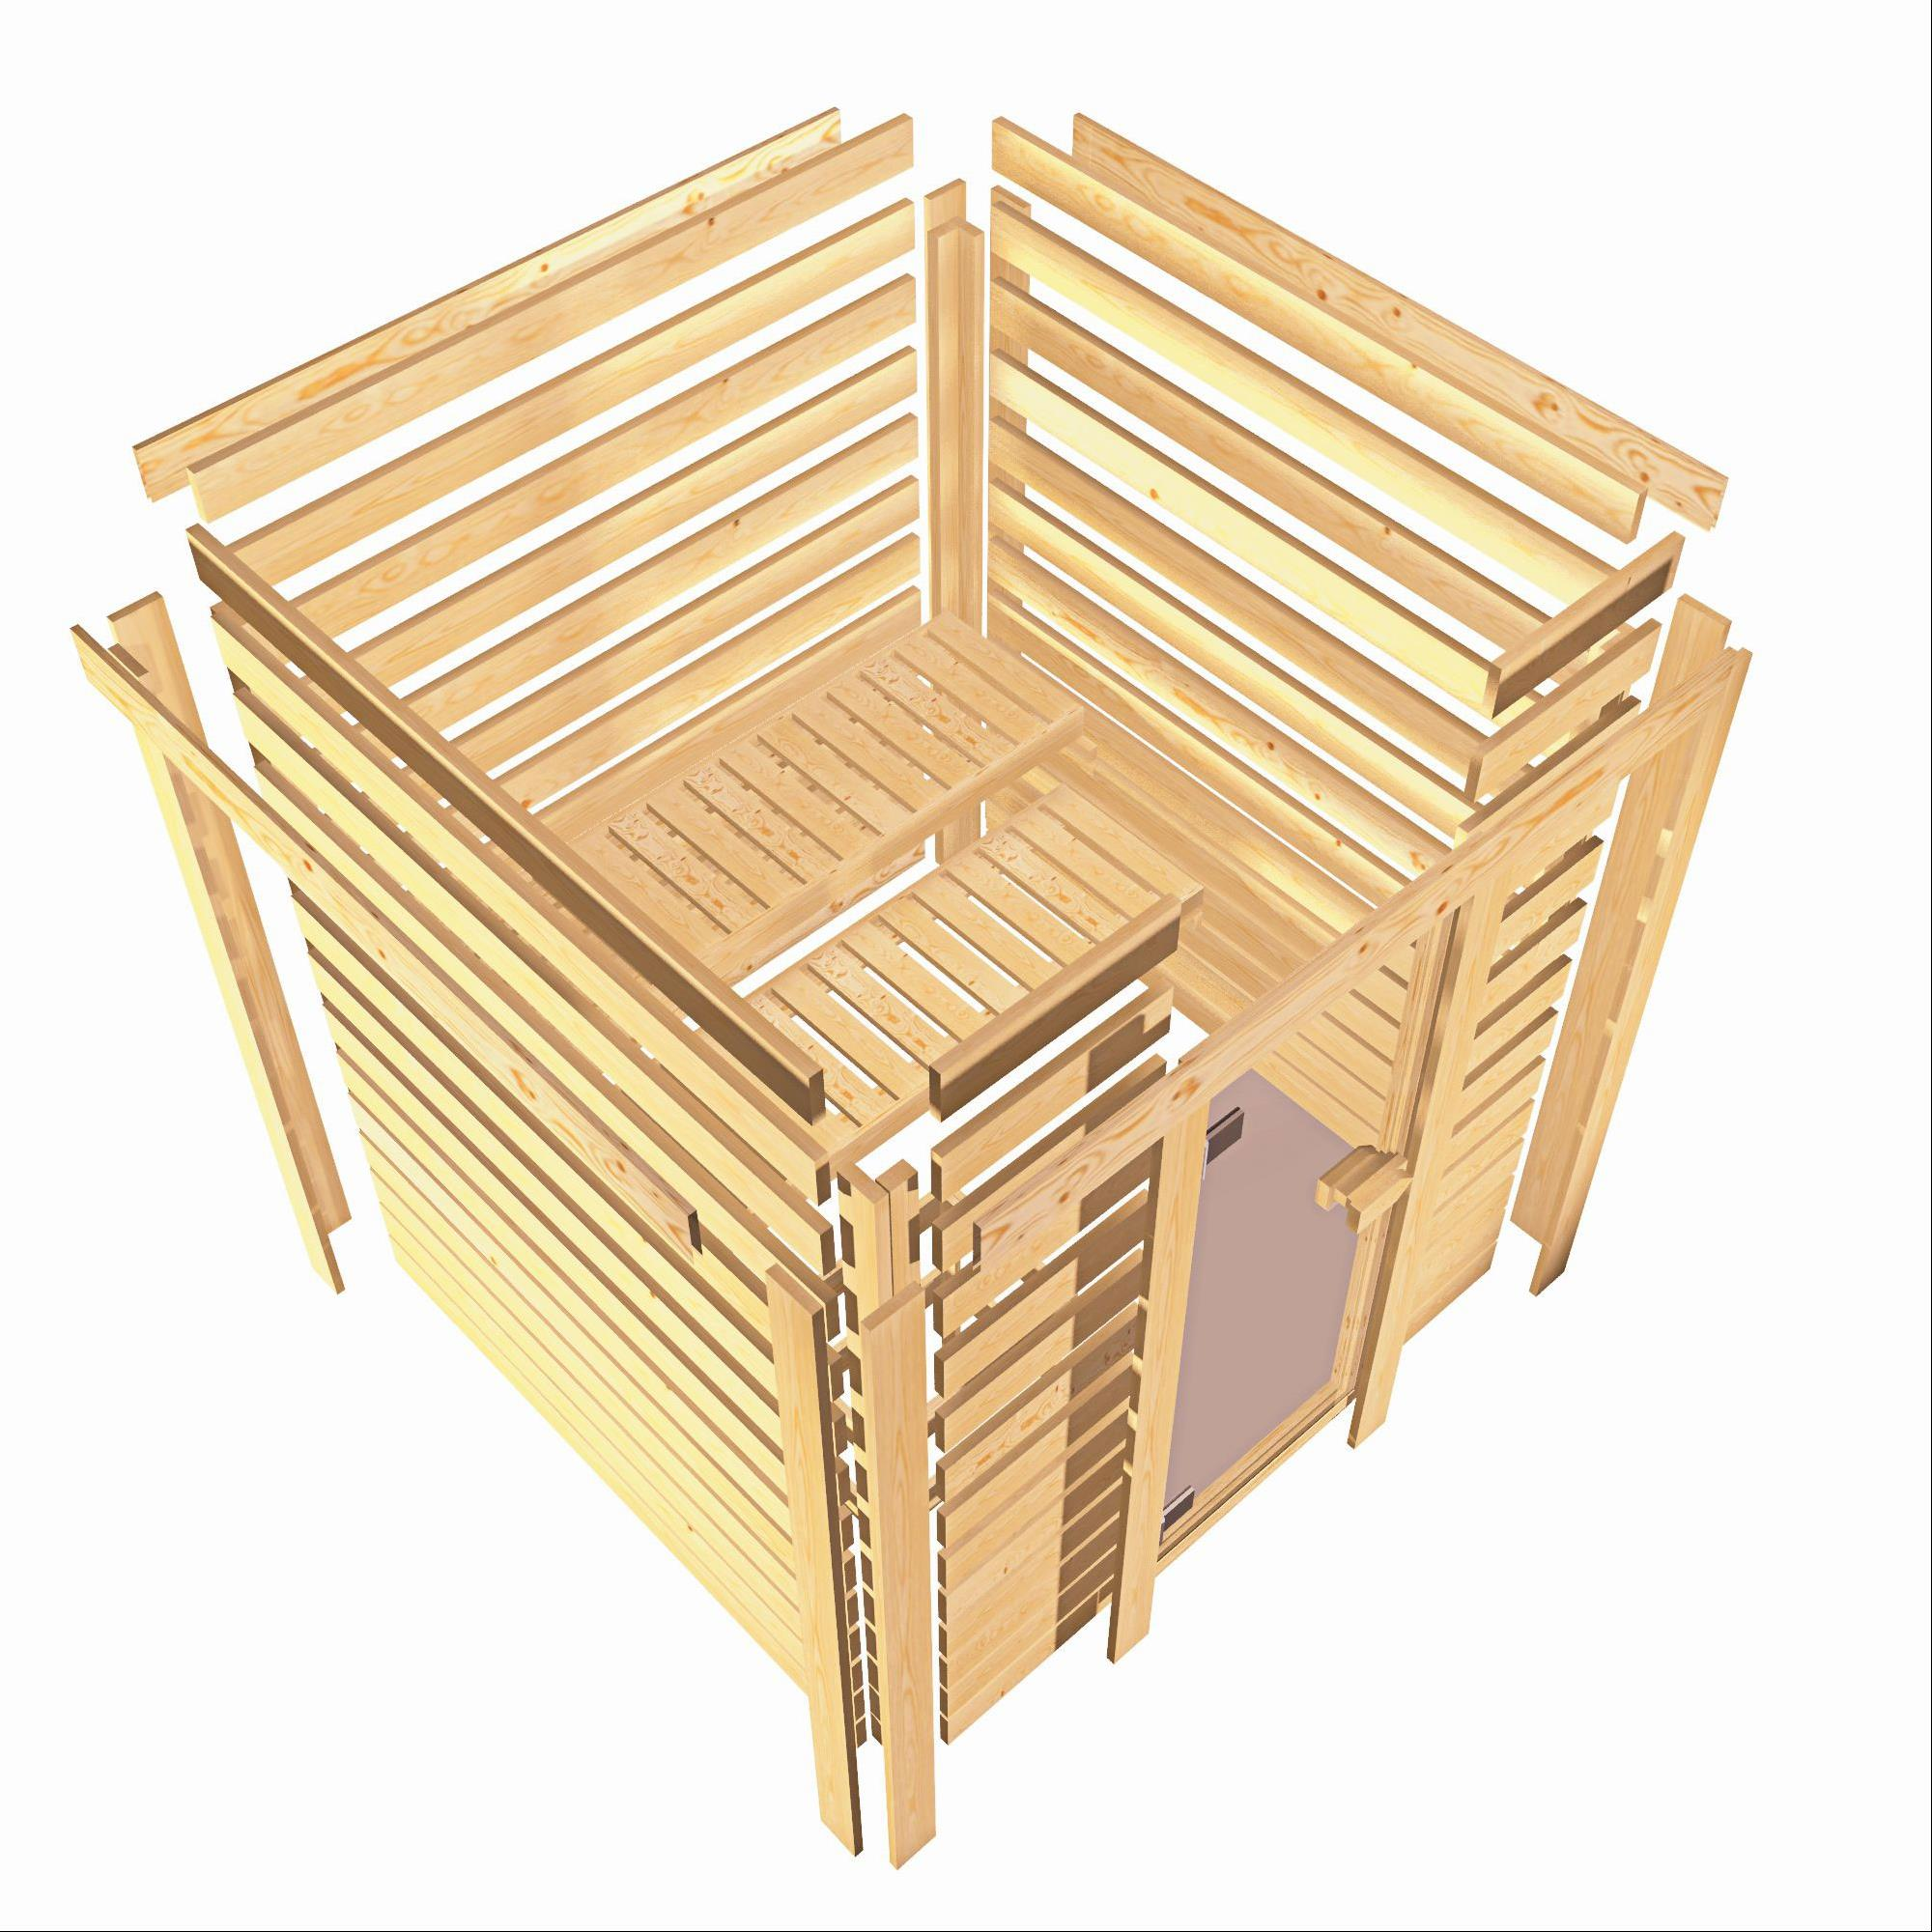 Woodfeeling Sauna Leona 38mm Kranz Ofen 9kW intern Tür Klarglas Bild 4